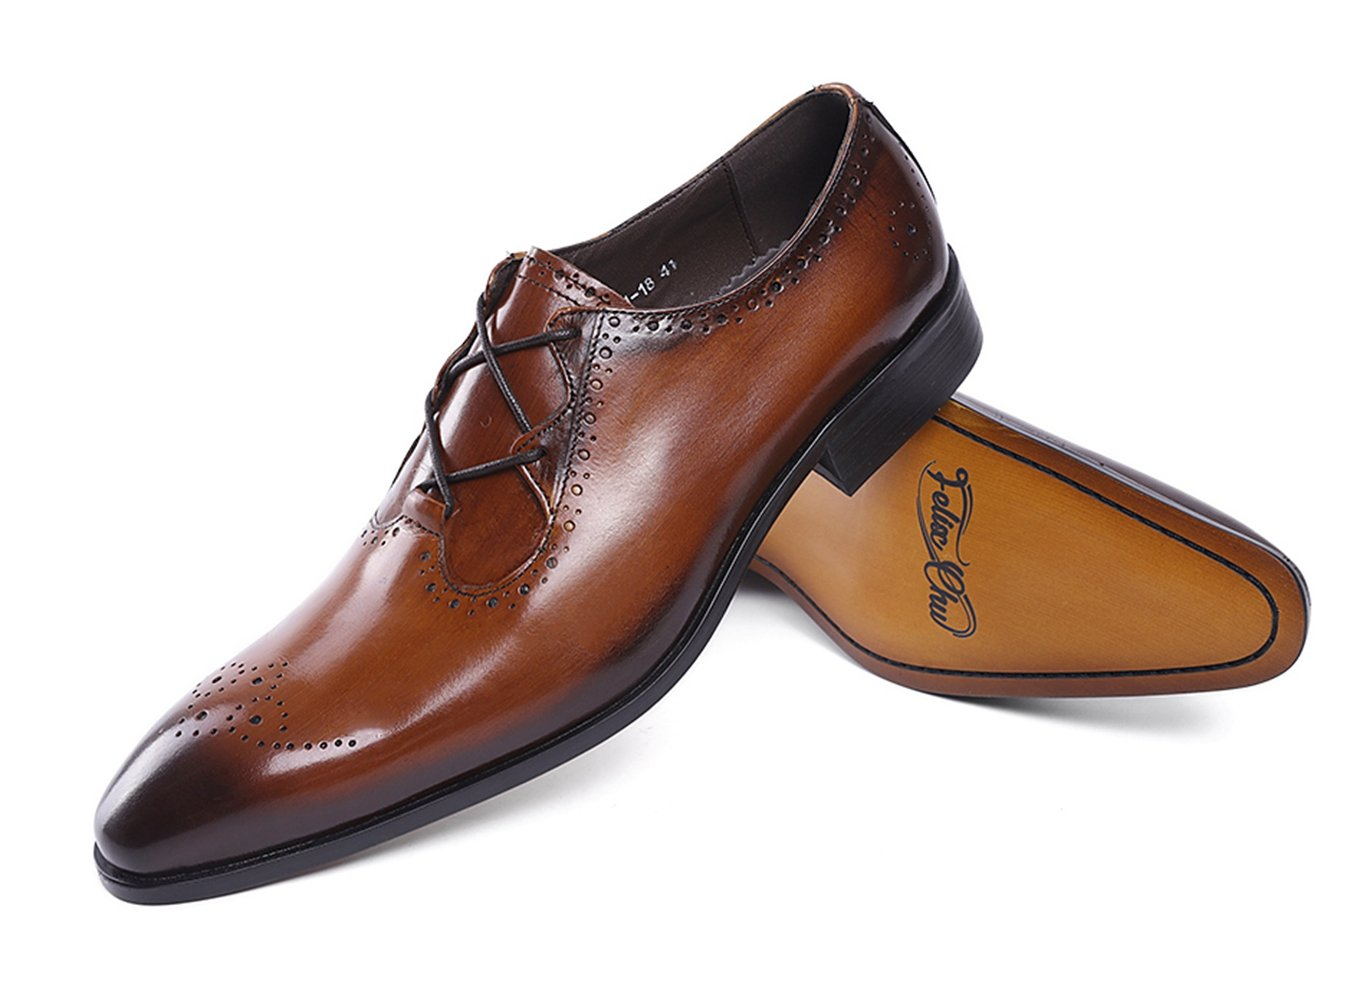 Felix Chu Men's Italian Designer Luxury Perfect Genuine Calf Leather shoes, Brown, 9 D(M) US by Felix Chu (Image #4)